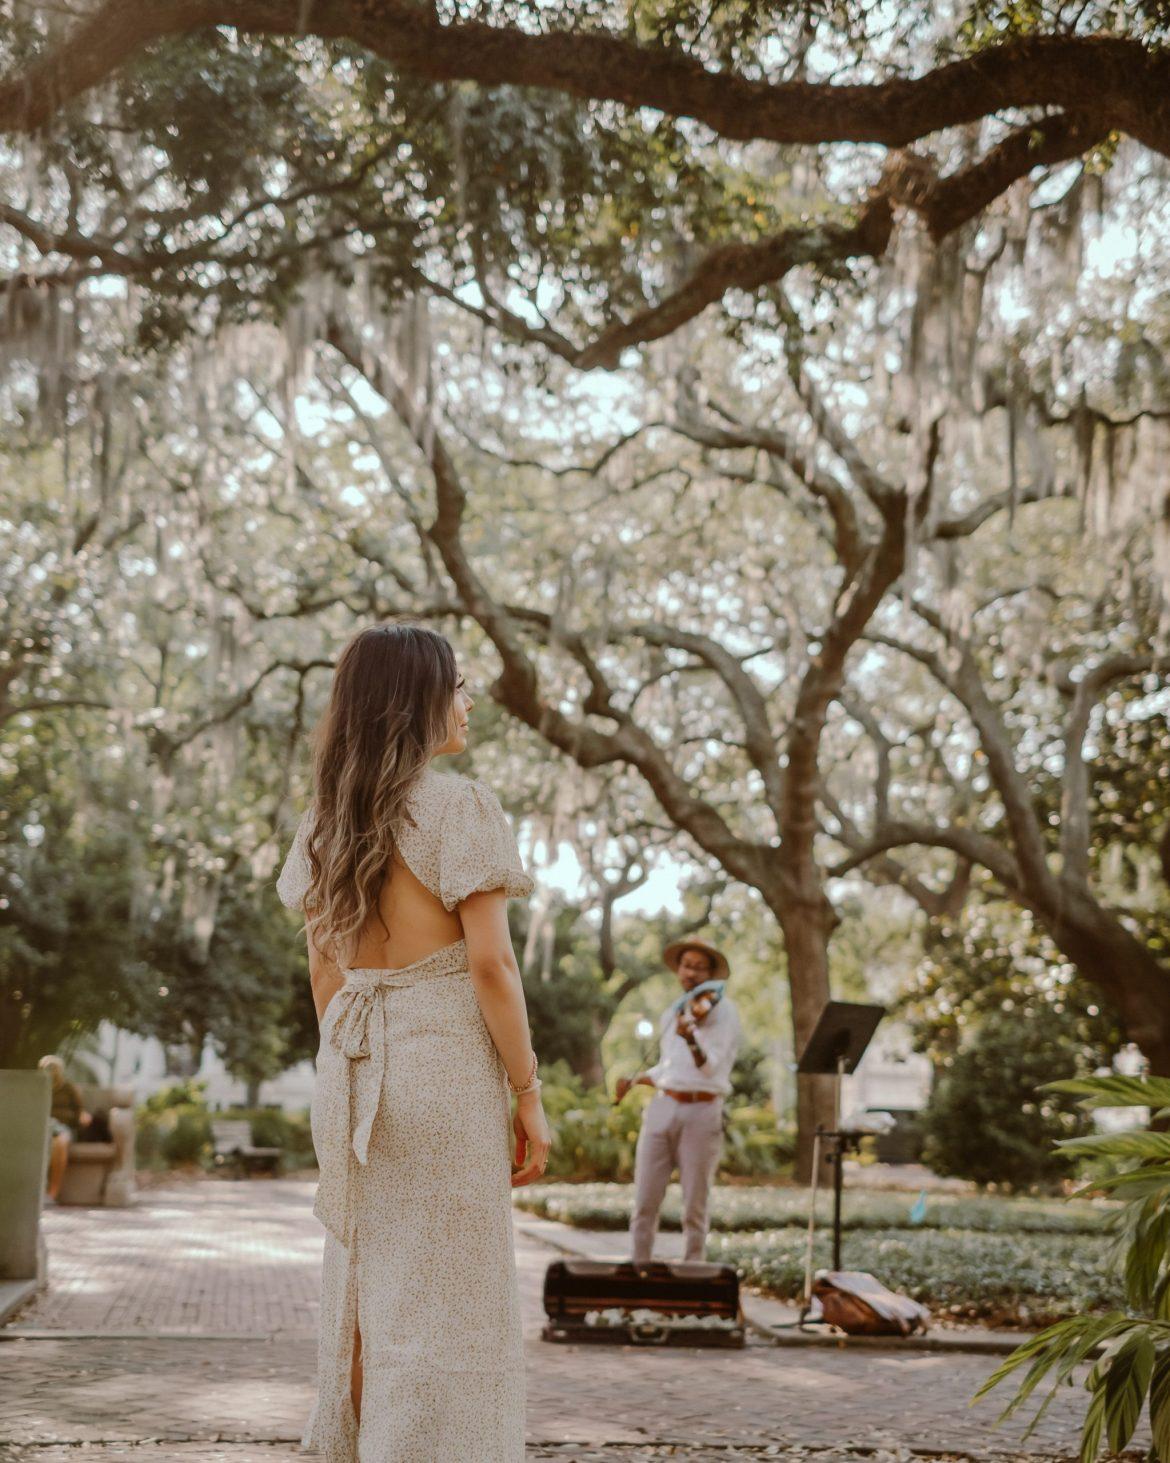 Town Squares in Savannah, Georgia   The Ultimate Savannah Travel Guide